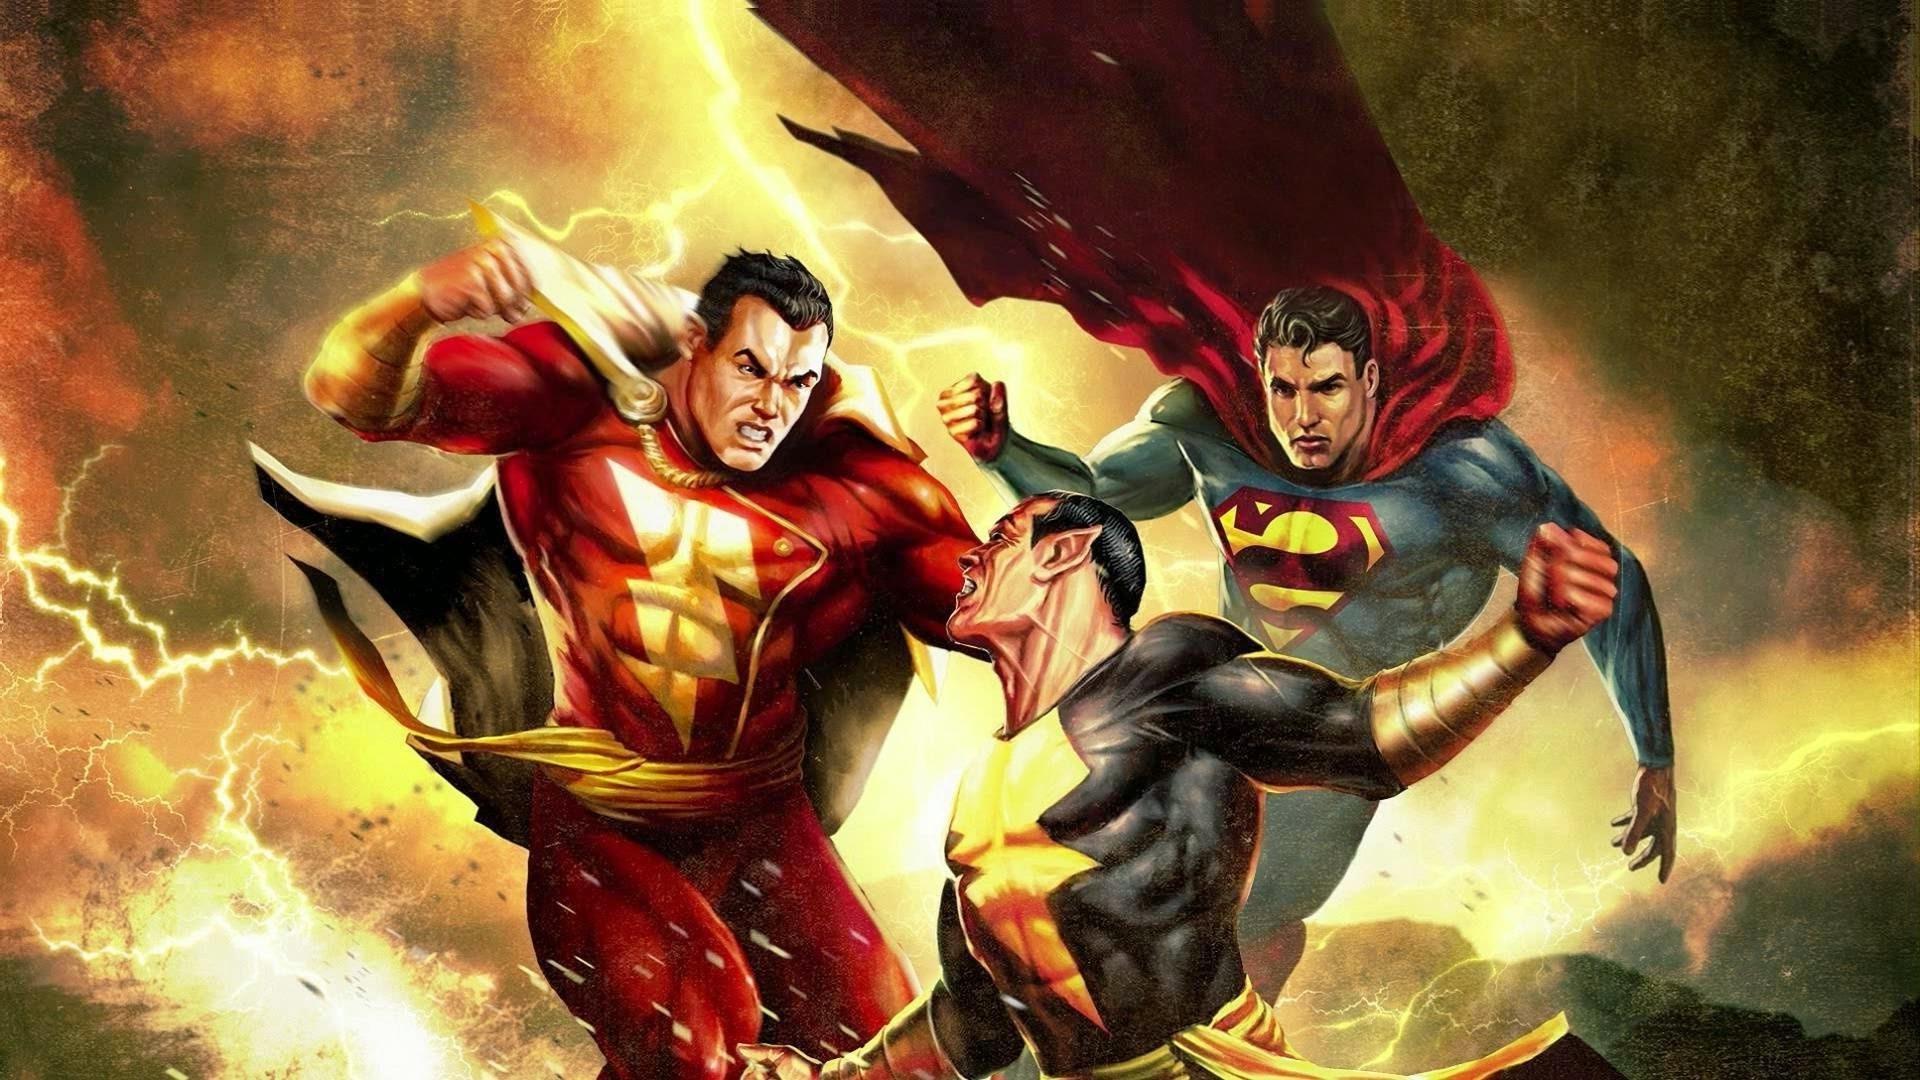 #Shazam vs. #BlackAdam vs. #Superman #EpicWallpaper XD